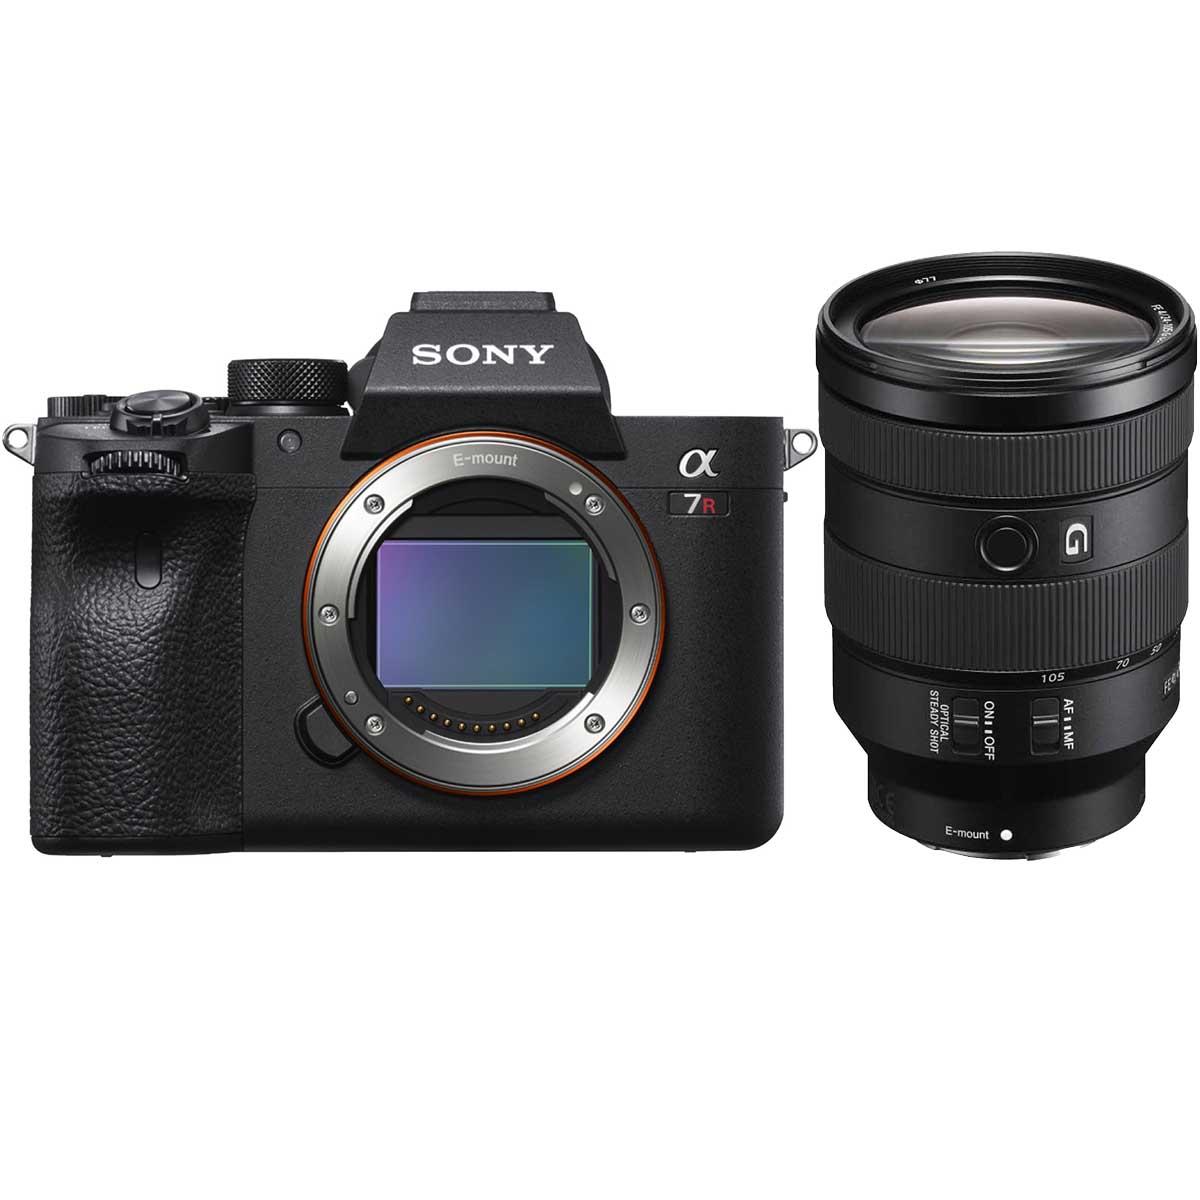 Sony Alpha 7R III A + SEL 24-105 mm 1:4,0 G OSS